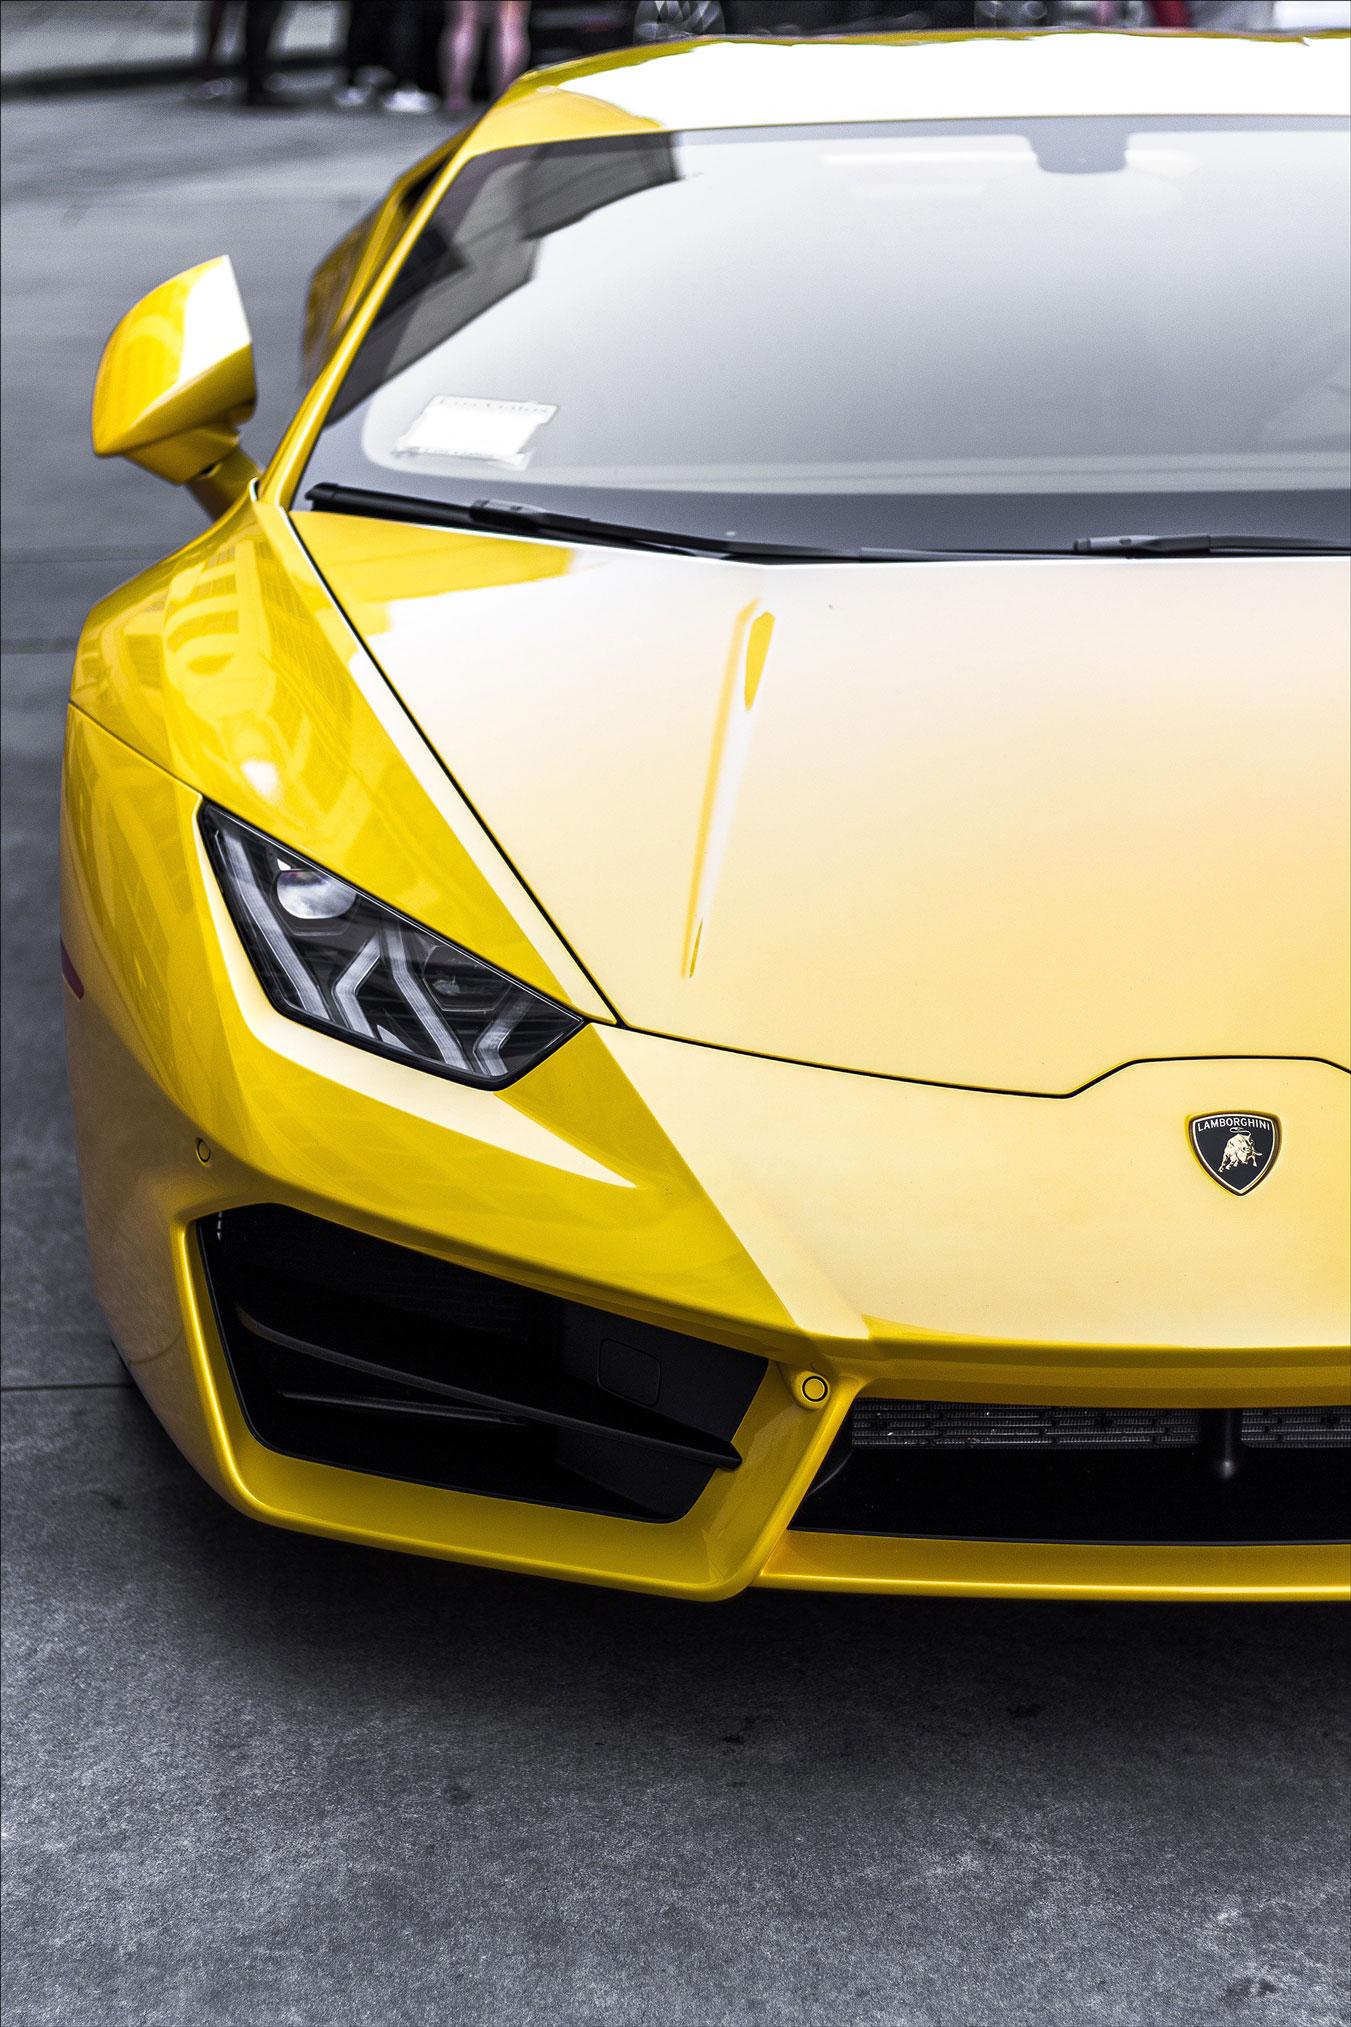 Lamborghini Huracan Luxury Vehicle Car Art Print Wall Decor ...